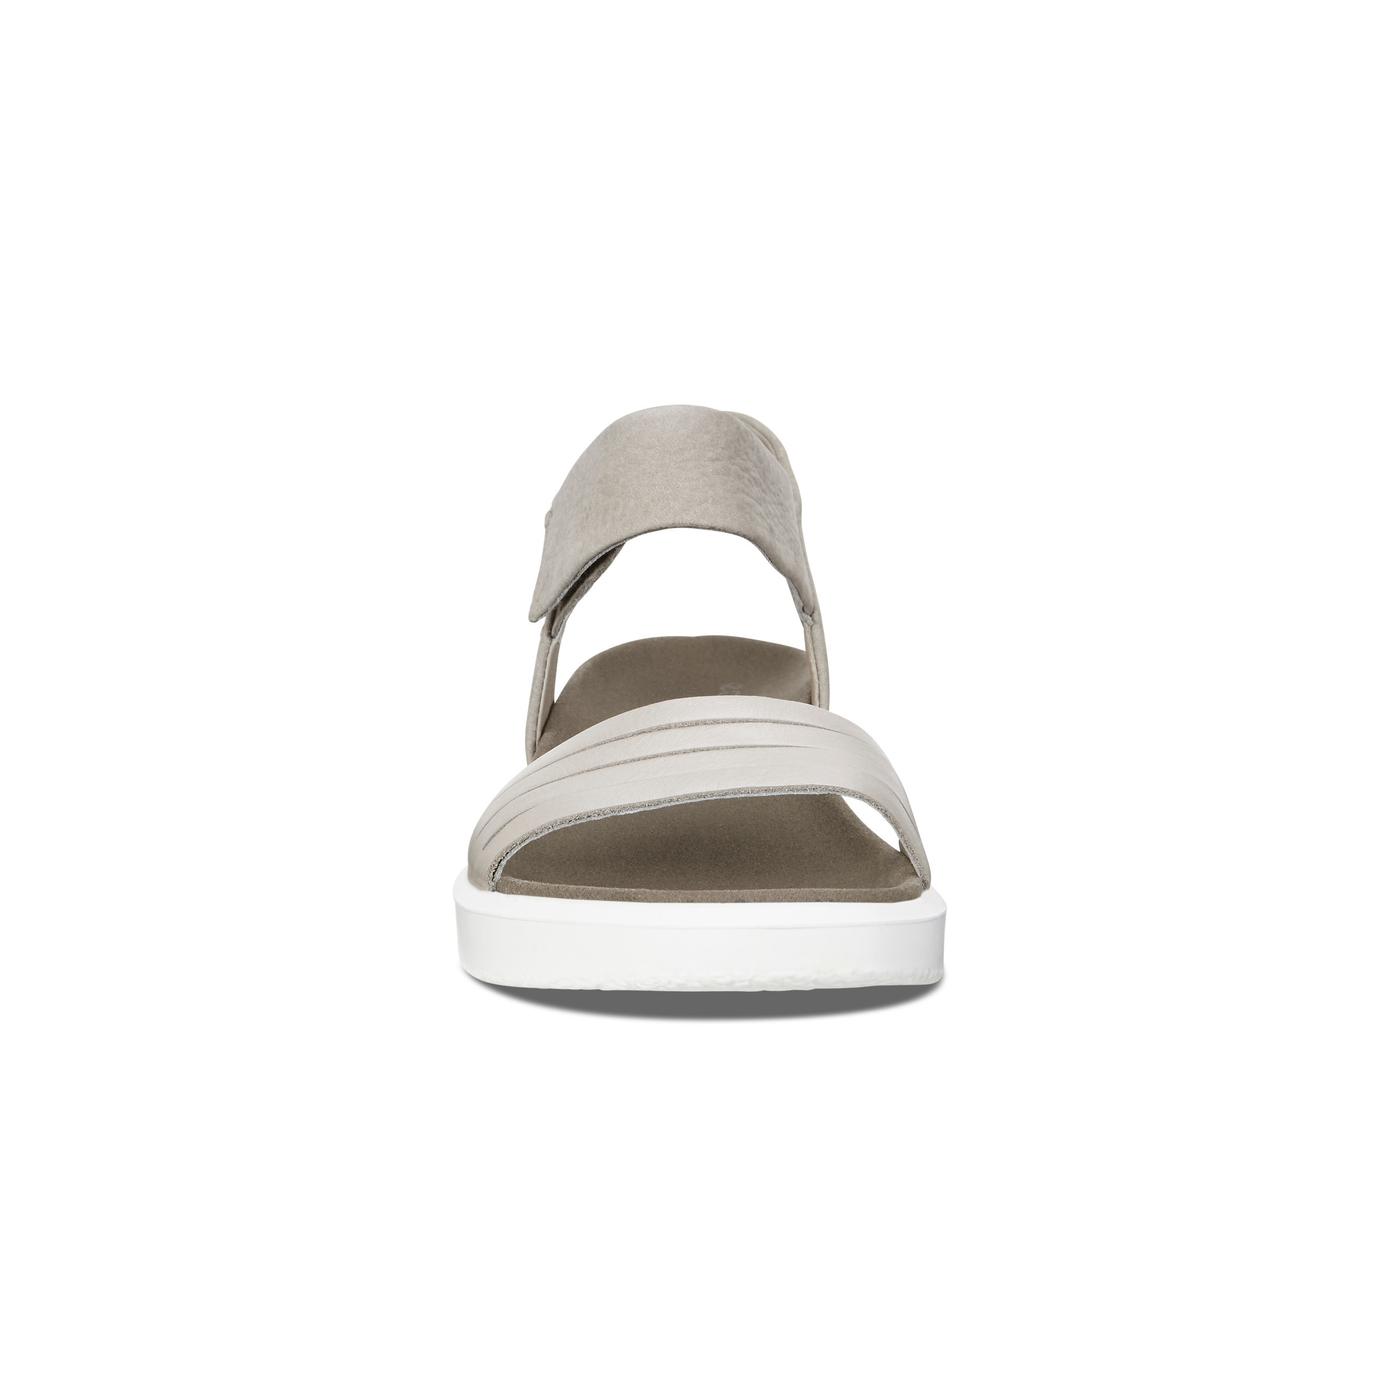 ECCO FLOWT Womens Ankle Strap Sandal